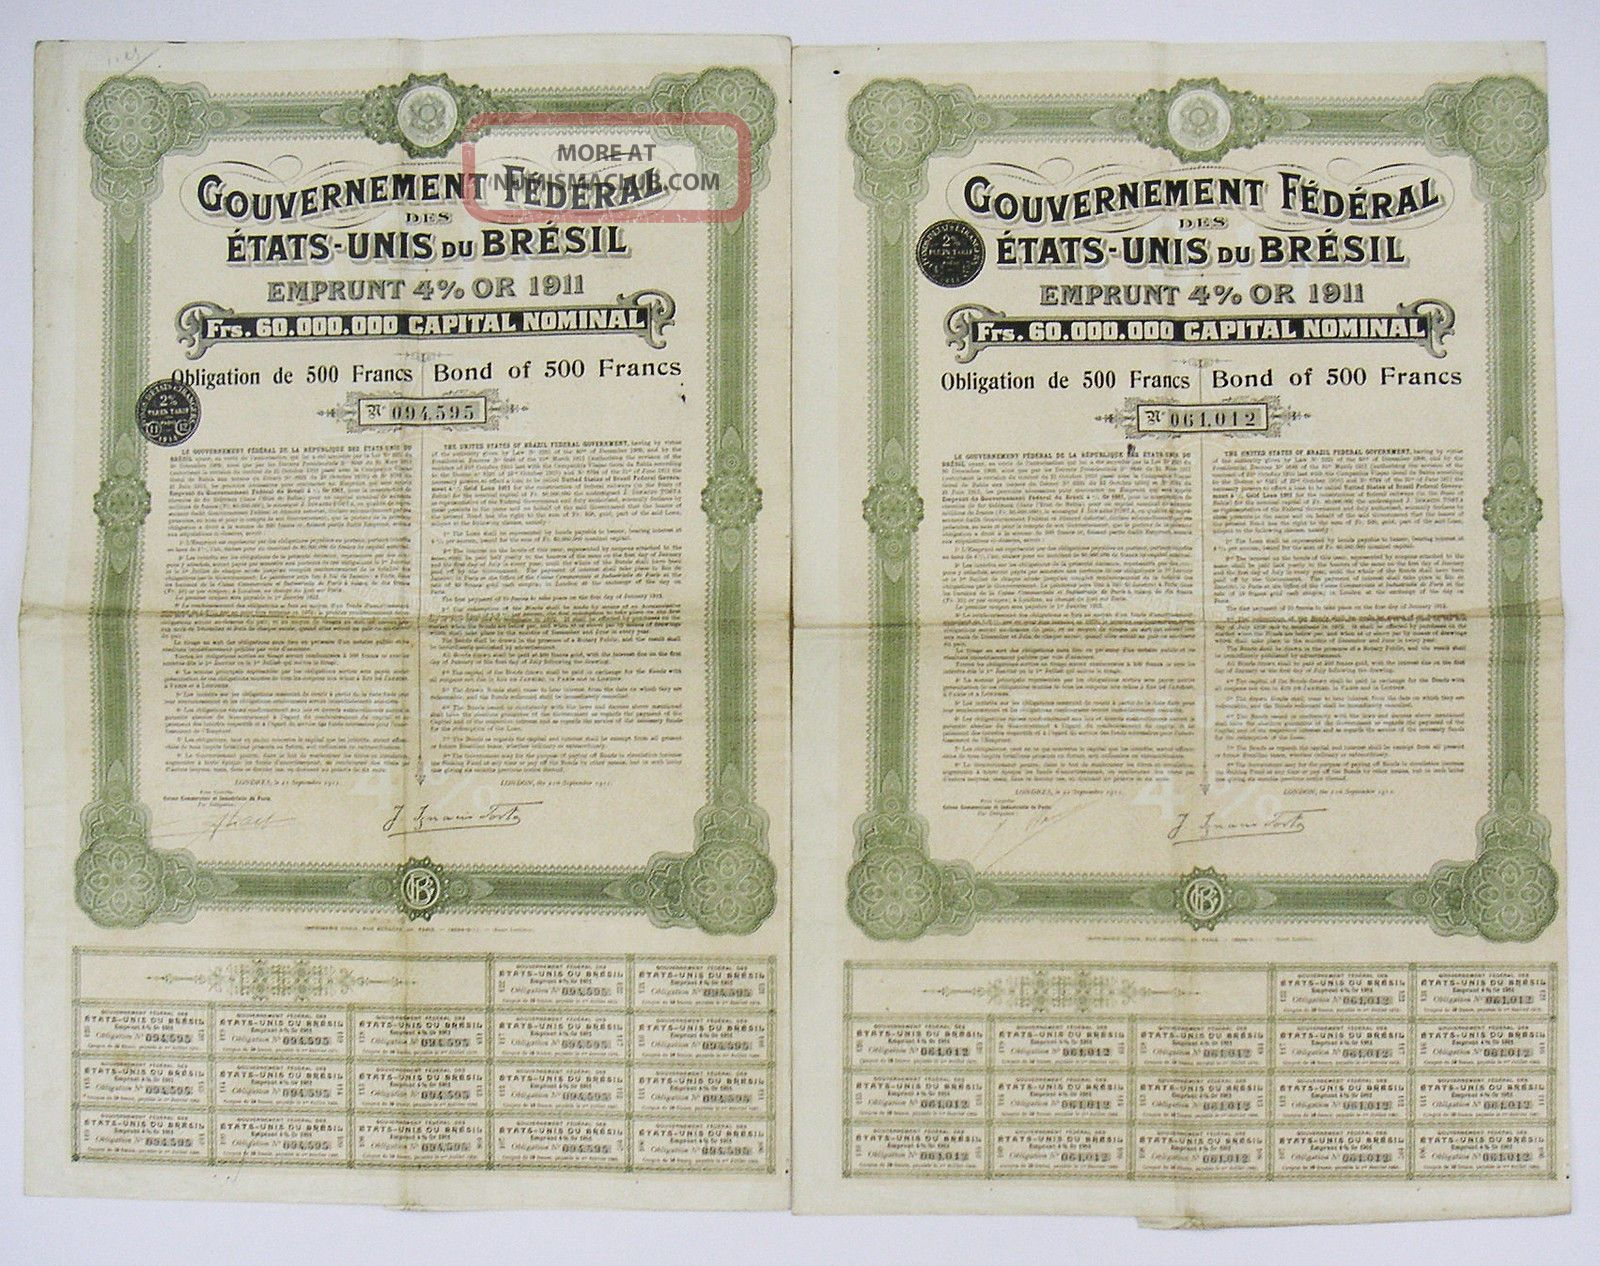 Gouv.  Federal Etats - Unis Du Bresil - Emprunt 4 Or 1911 - Bond Of 500f (x2) Stocks & Bonds, Scripophily photo